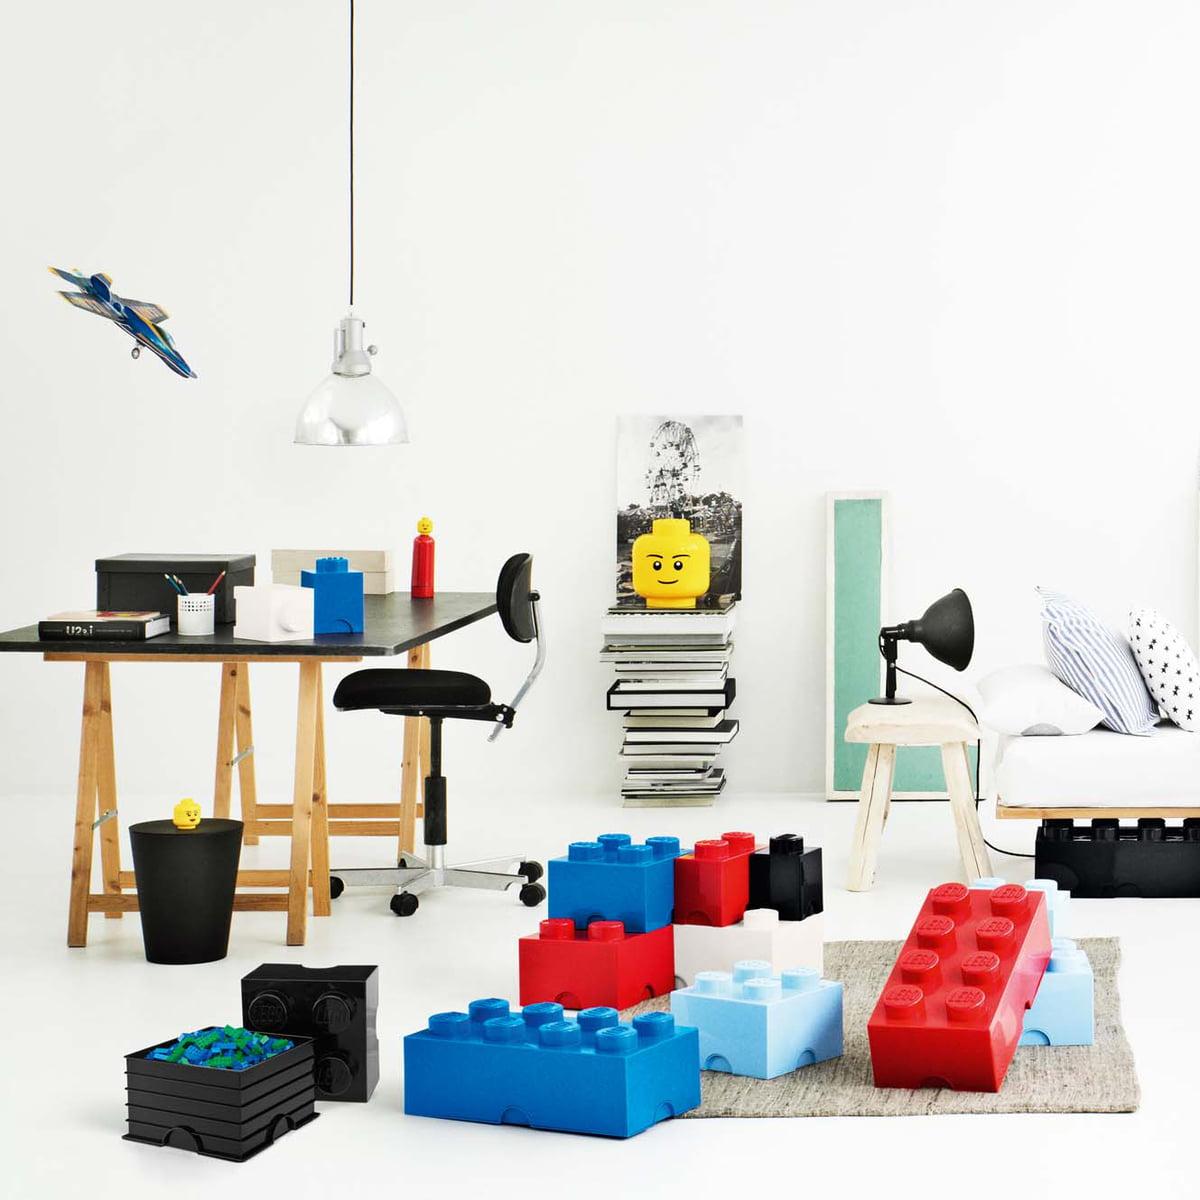 storage brick 1 by lego in the home design shop. Black Bedroom Furniture Sets. Home Design Ideas